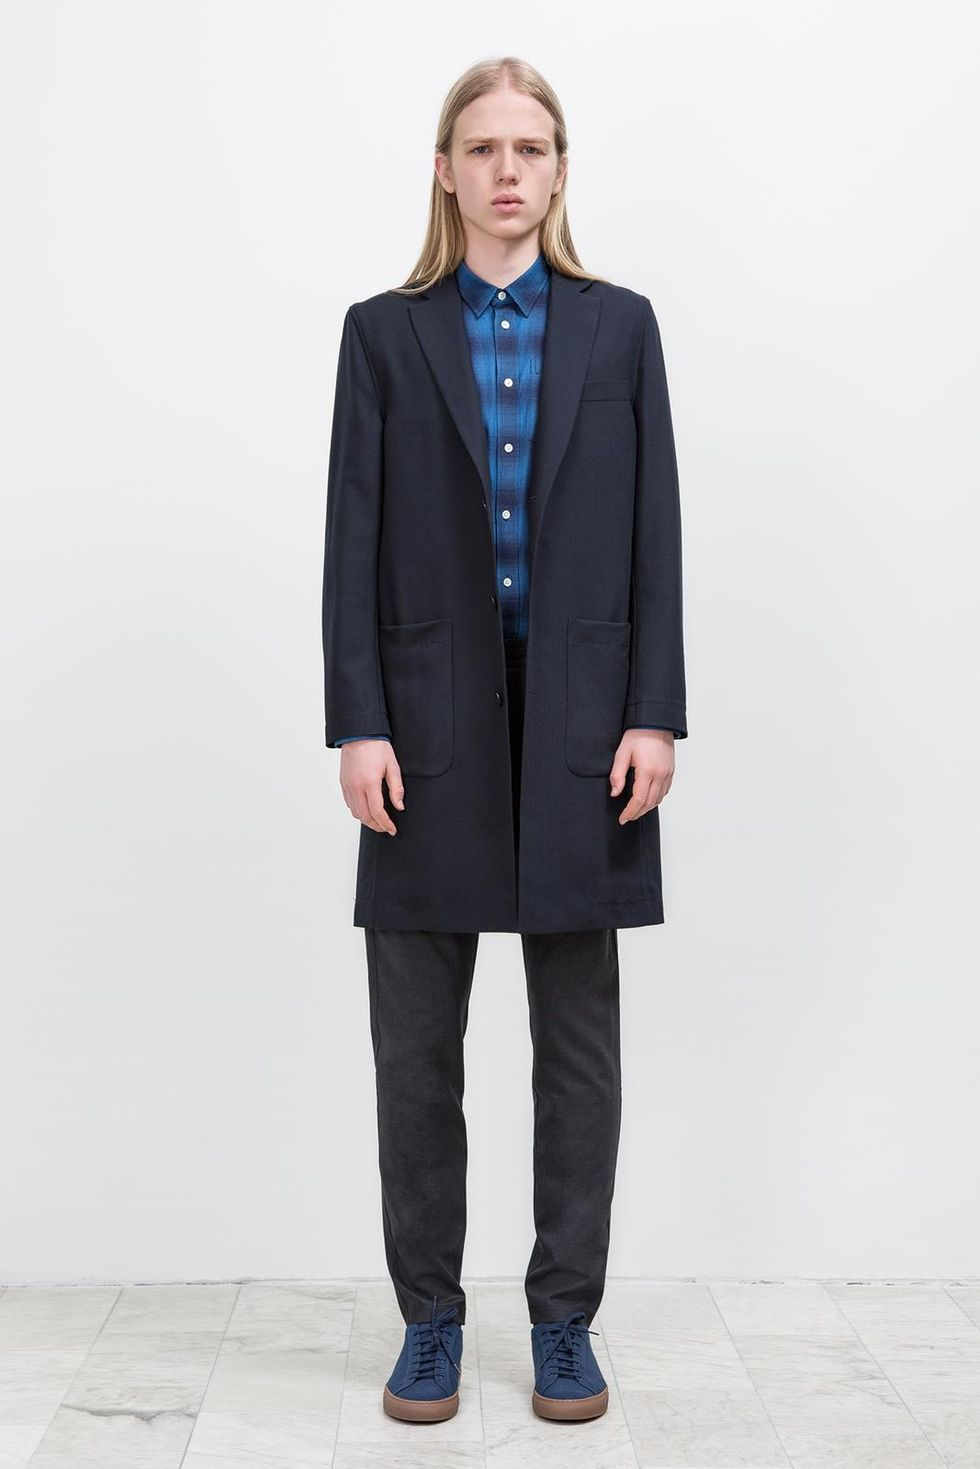 tres-bien-menswear-collection-spring-summer-2015-02.jpg